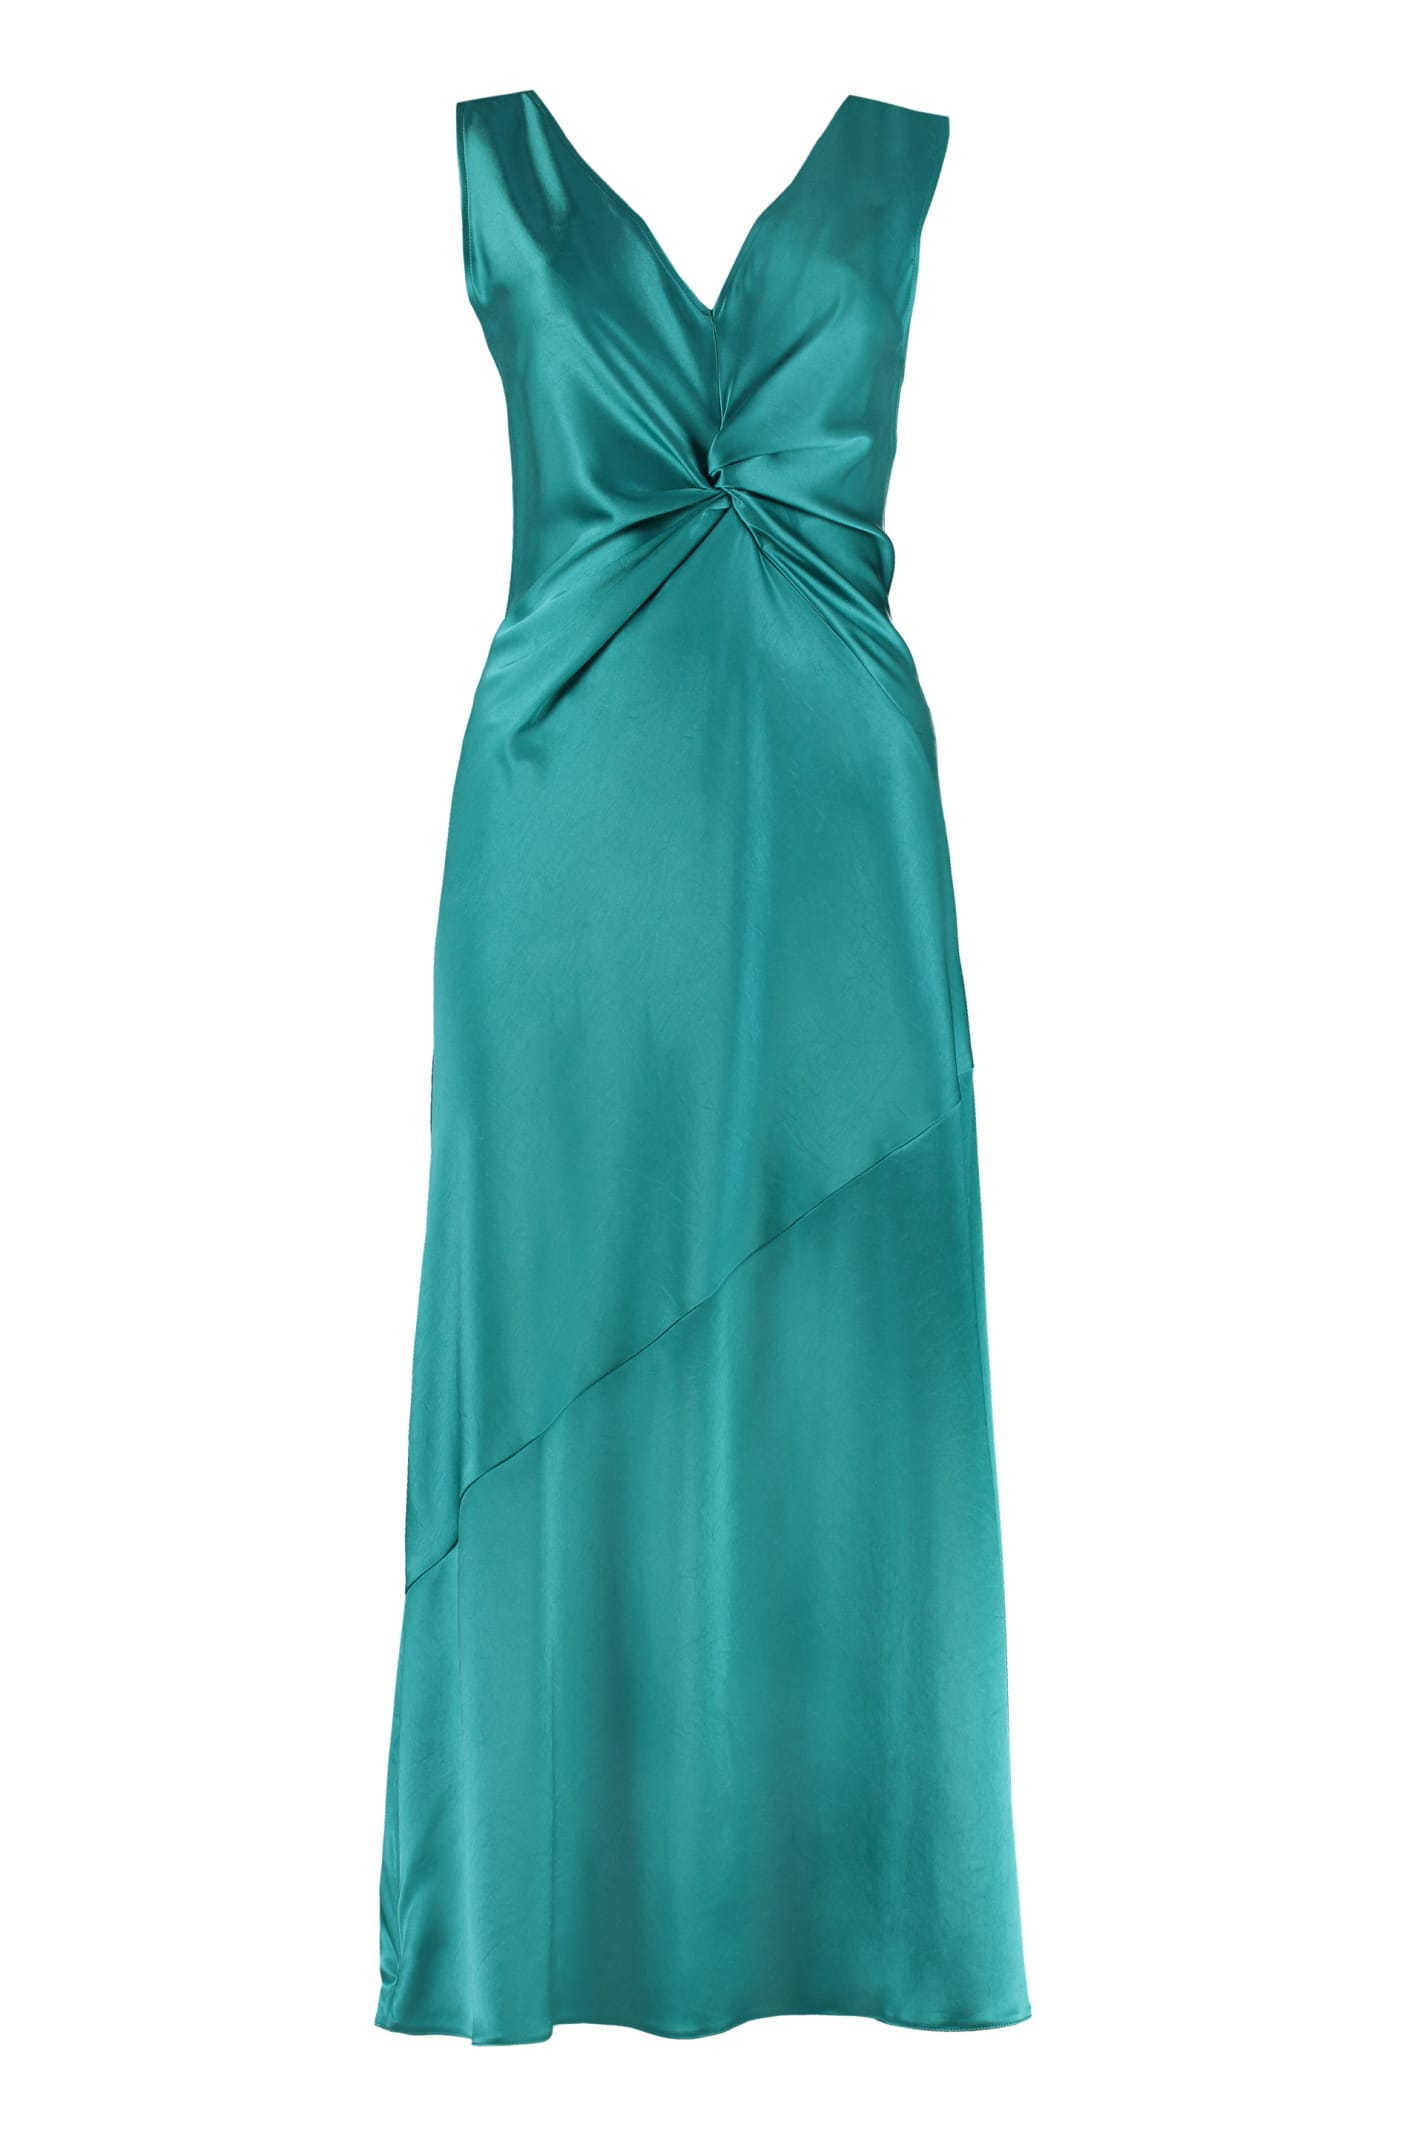 Pinko Minestra Satin Dress